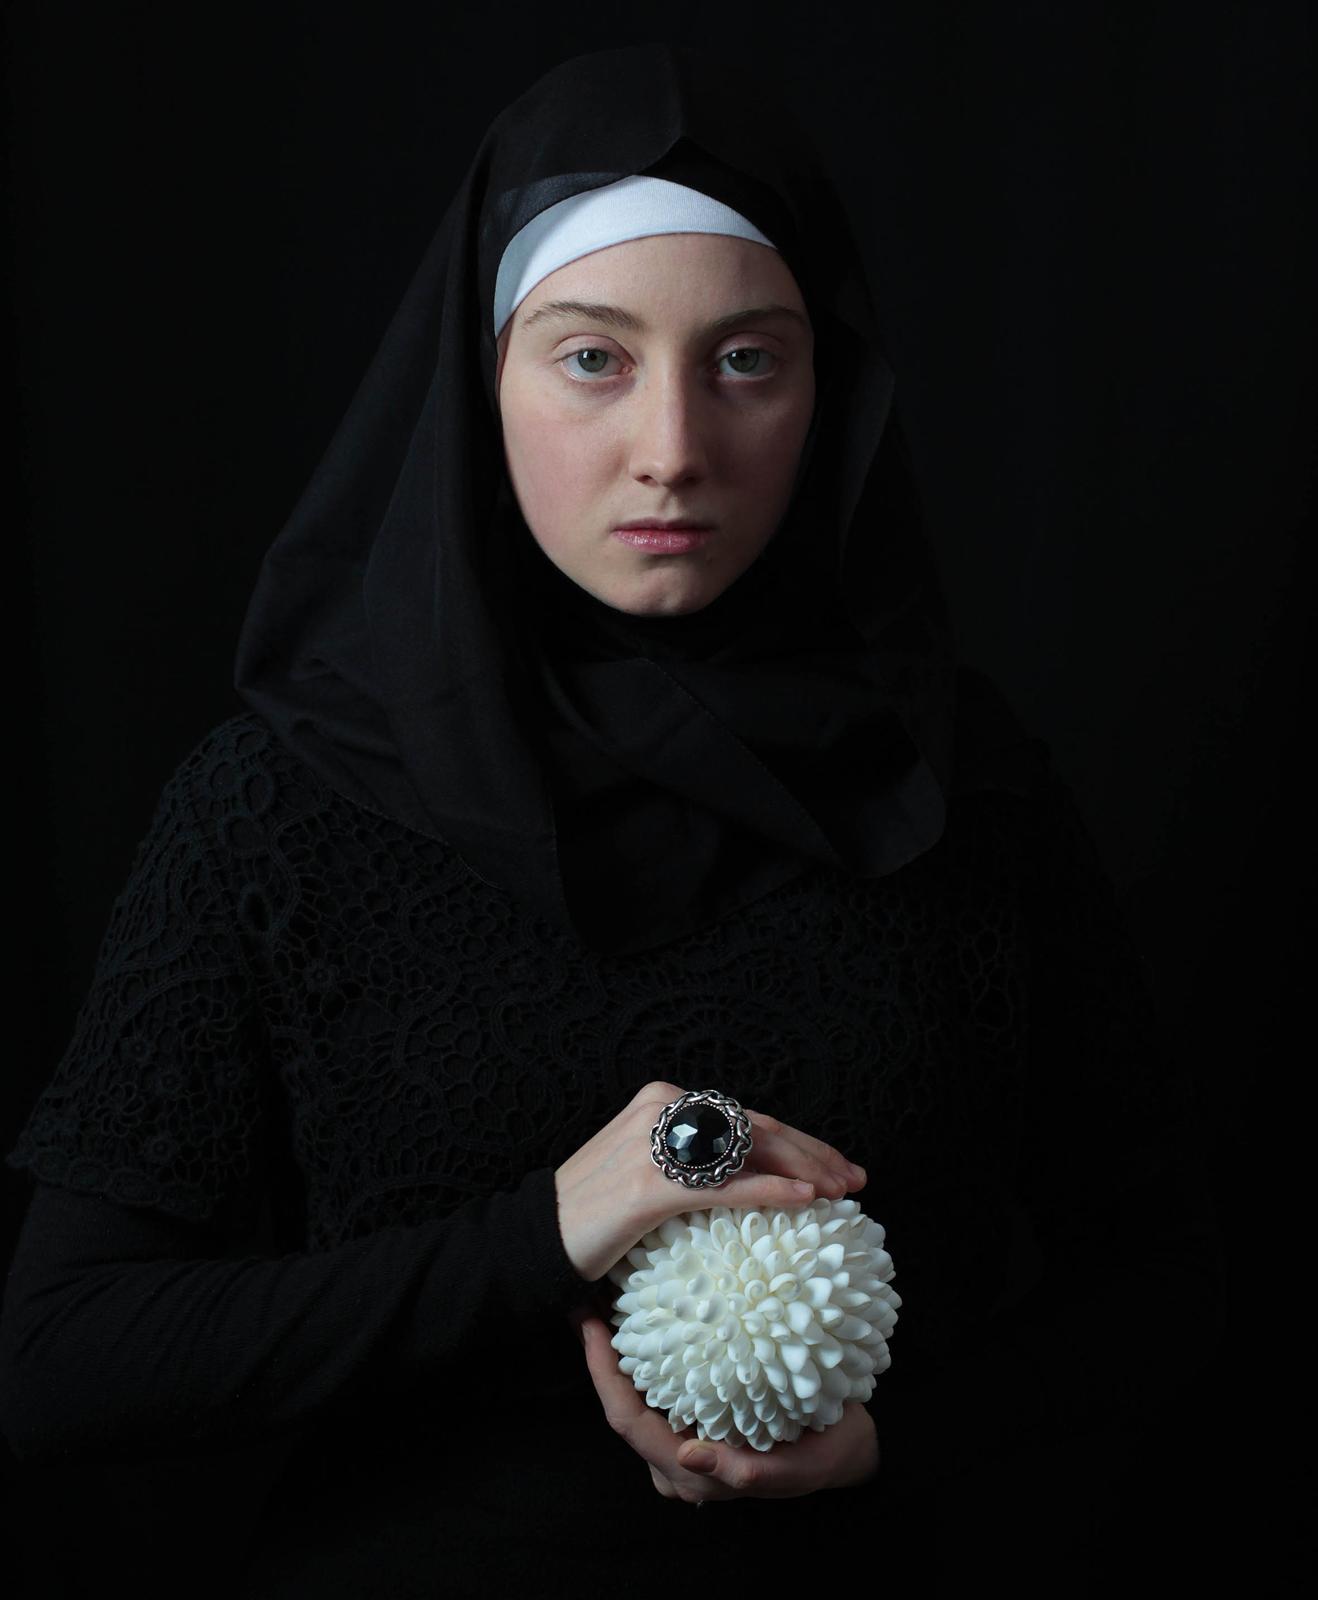 Carla Iacono, Re-velation